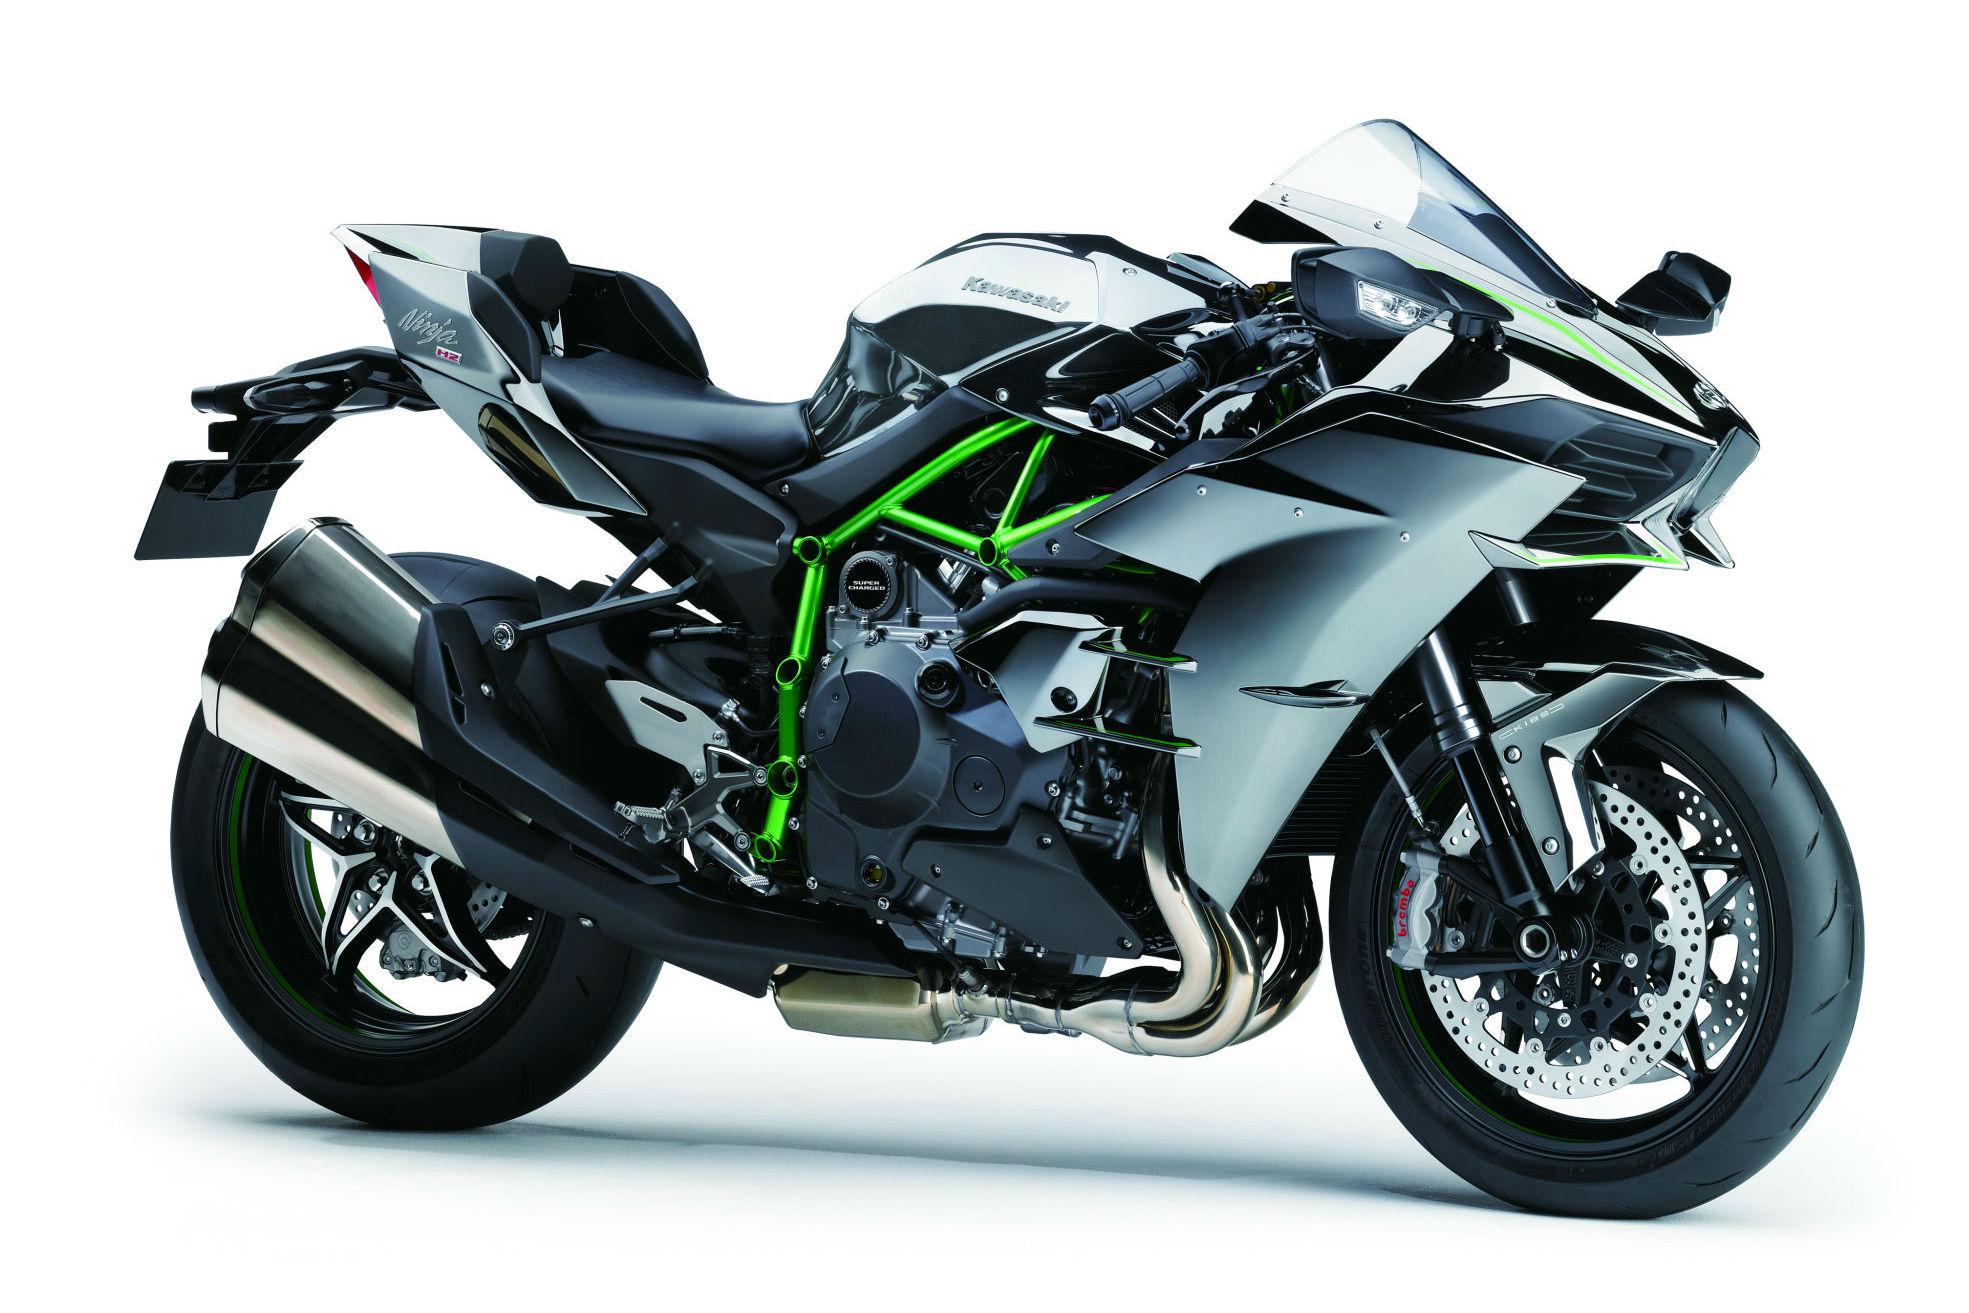 Kawasaki Ninja H2 price announced in US